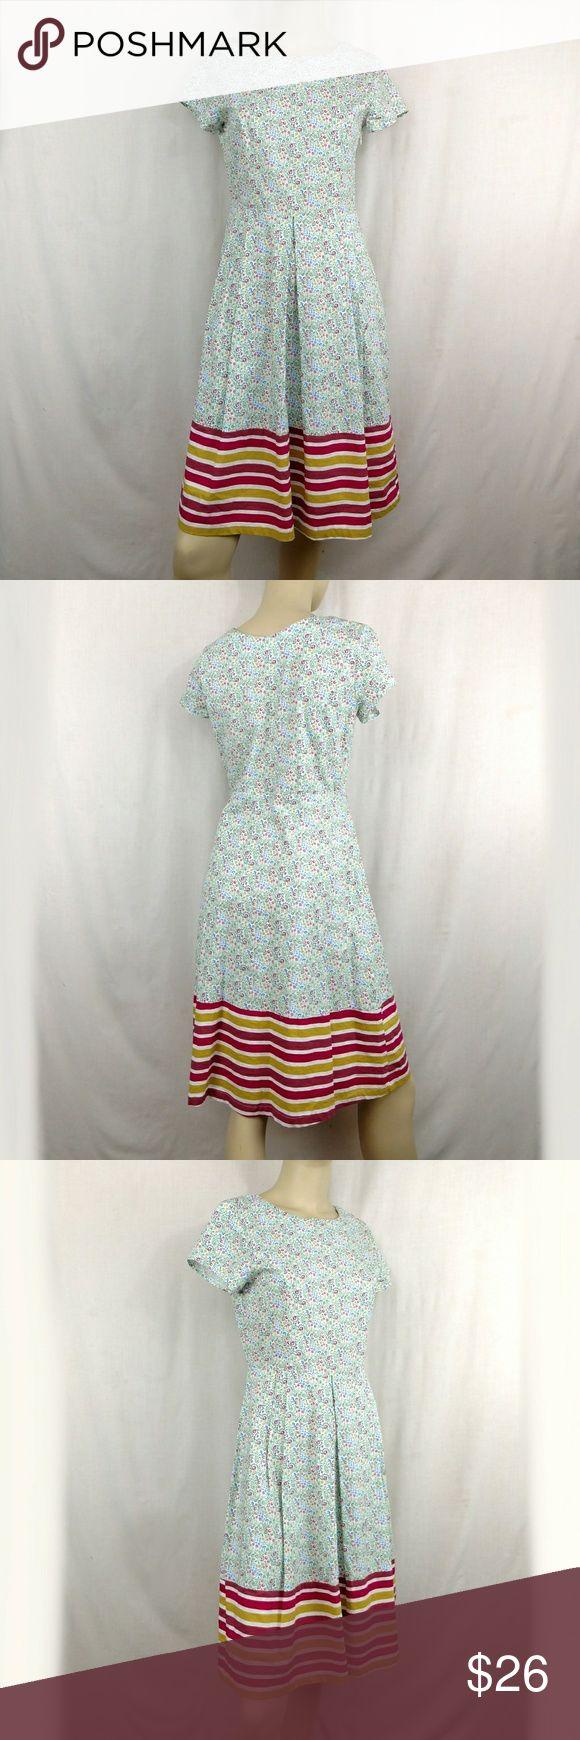 DOWNEAST floral dress. Medium DOWNEAST floral cocktail tea dress. Women's Medium Beautiful floral dress. Lined design at the bottom of skirt. Medium.  (G) Downeast Dresses